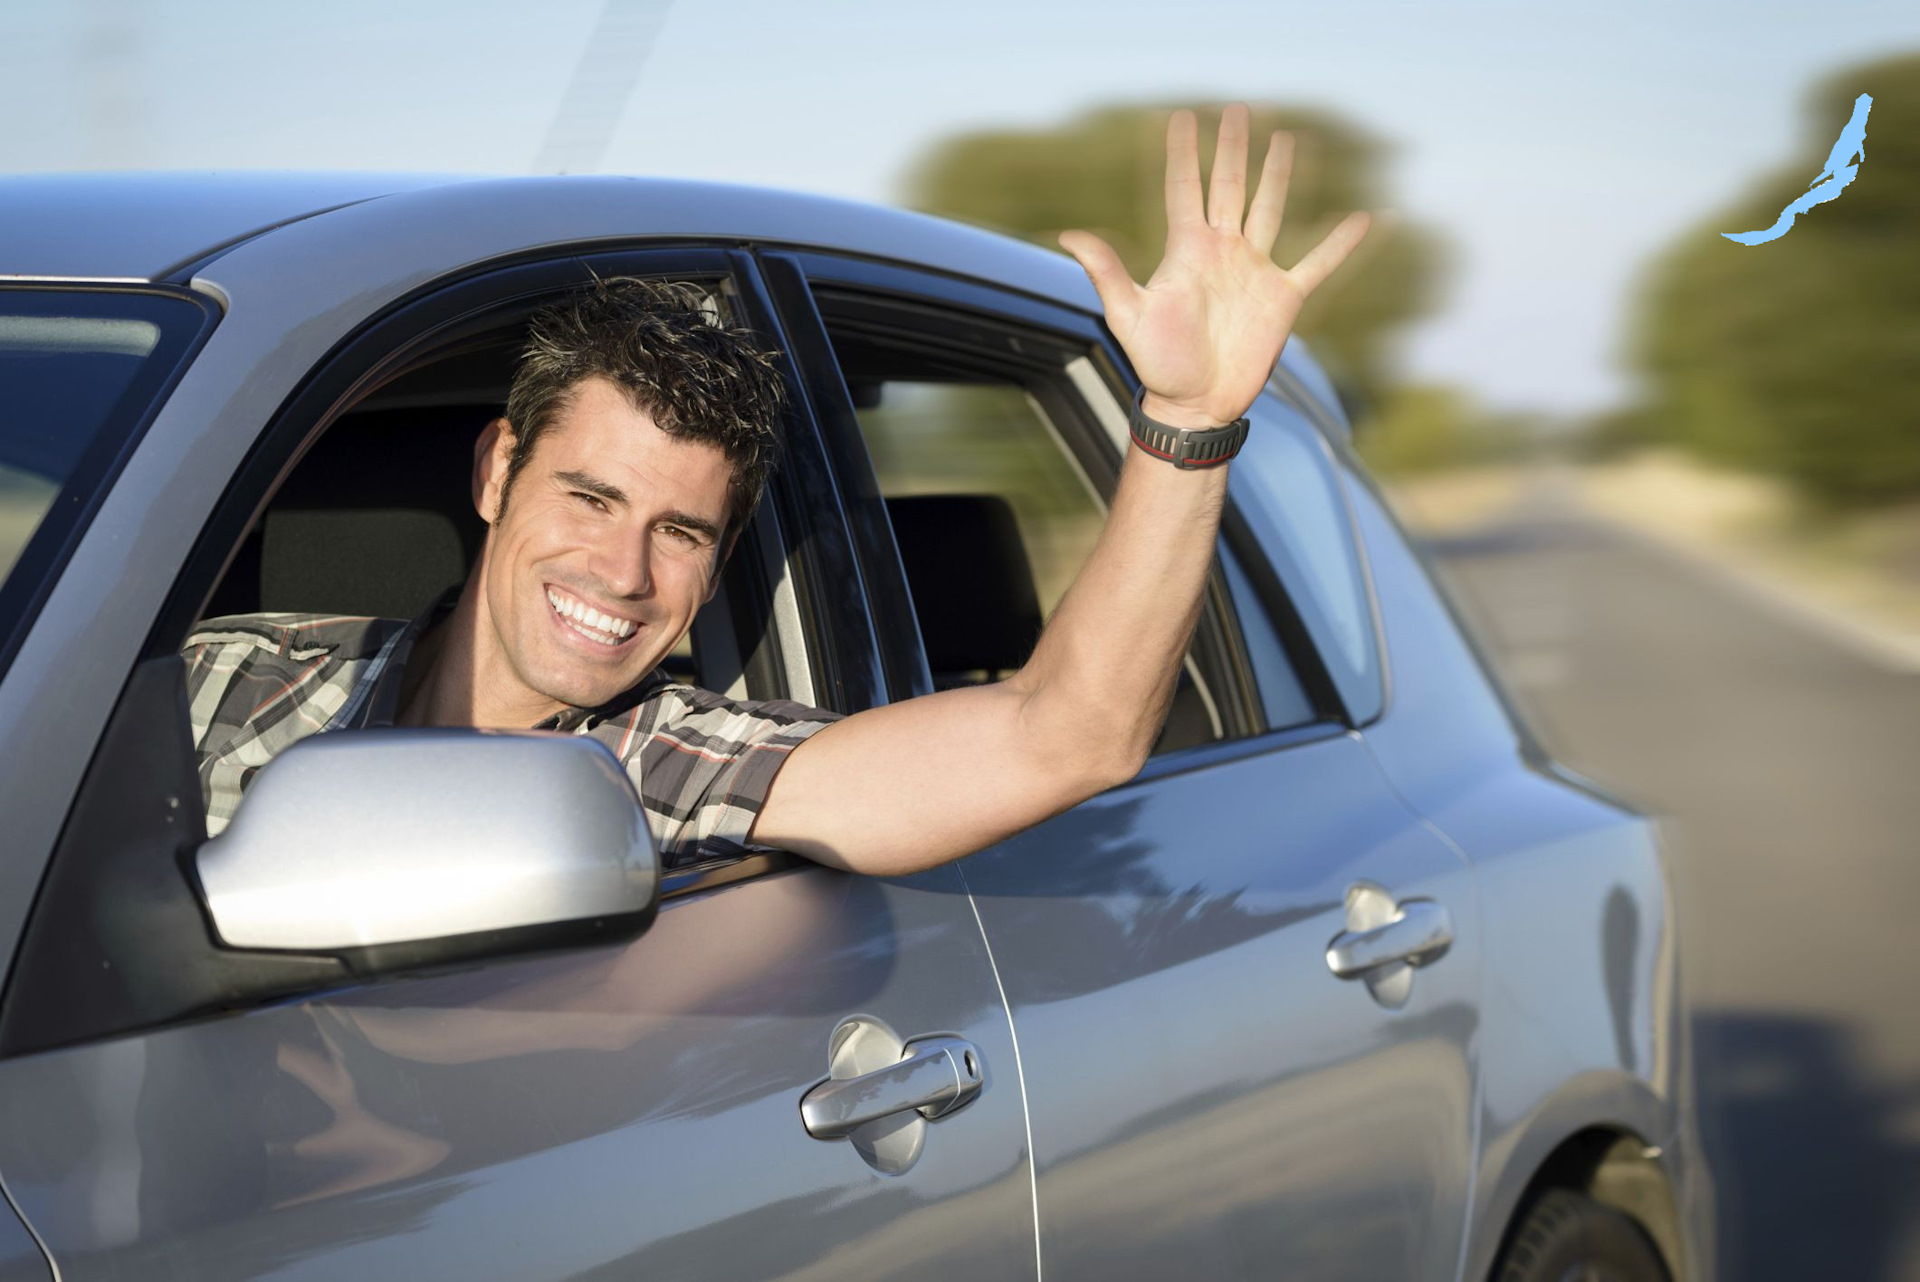 фото одного мужчины на машине подготовили